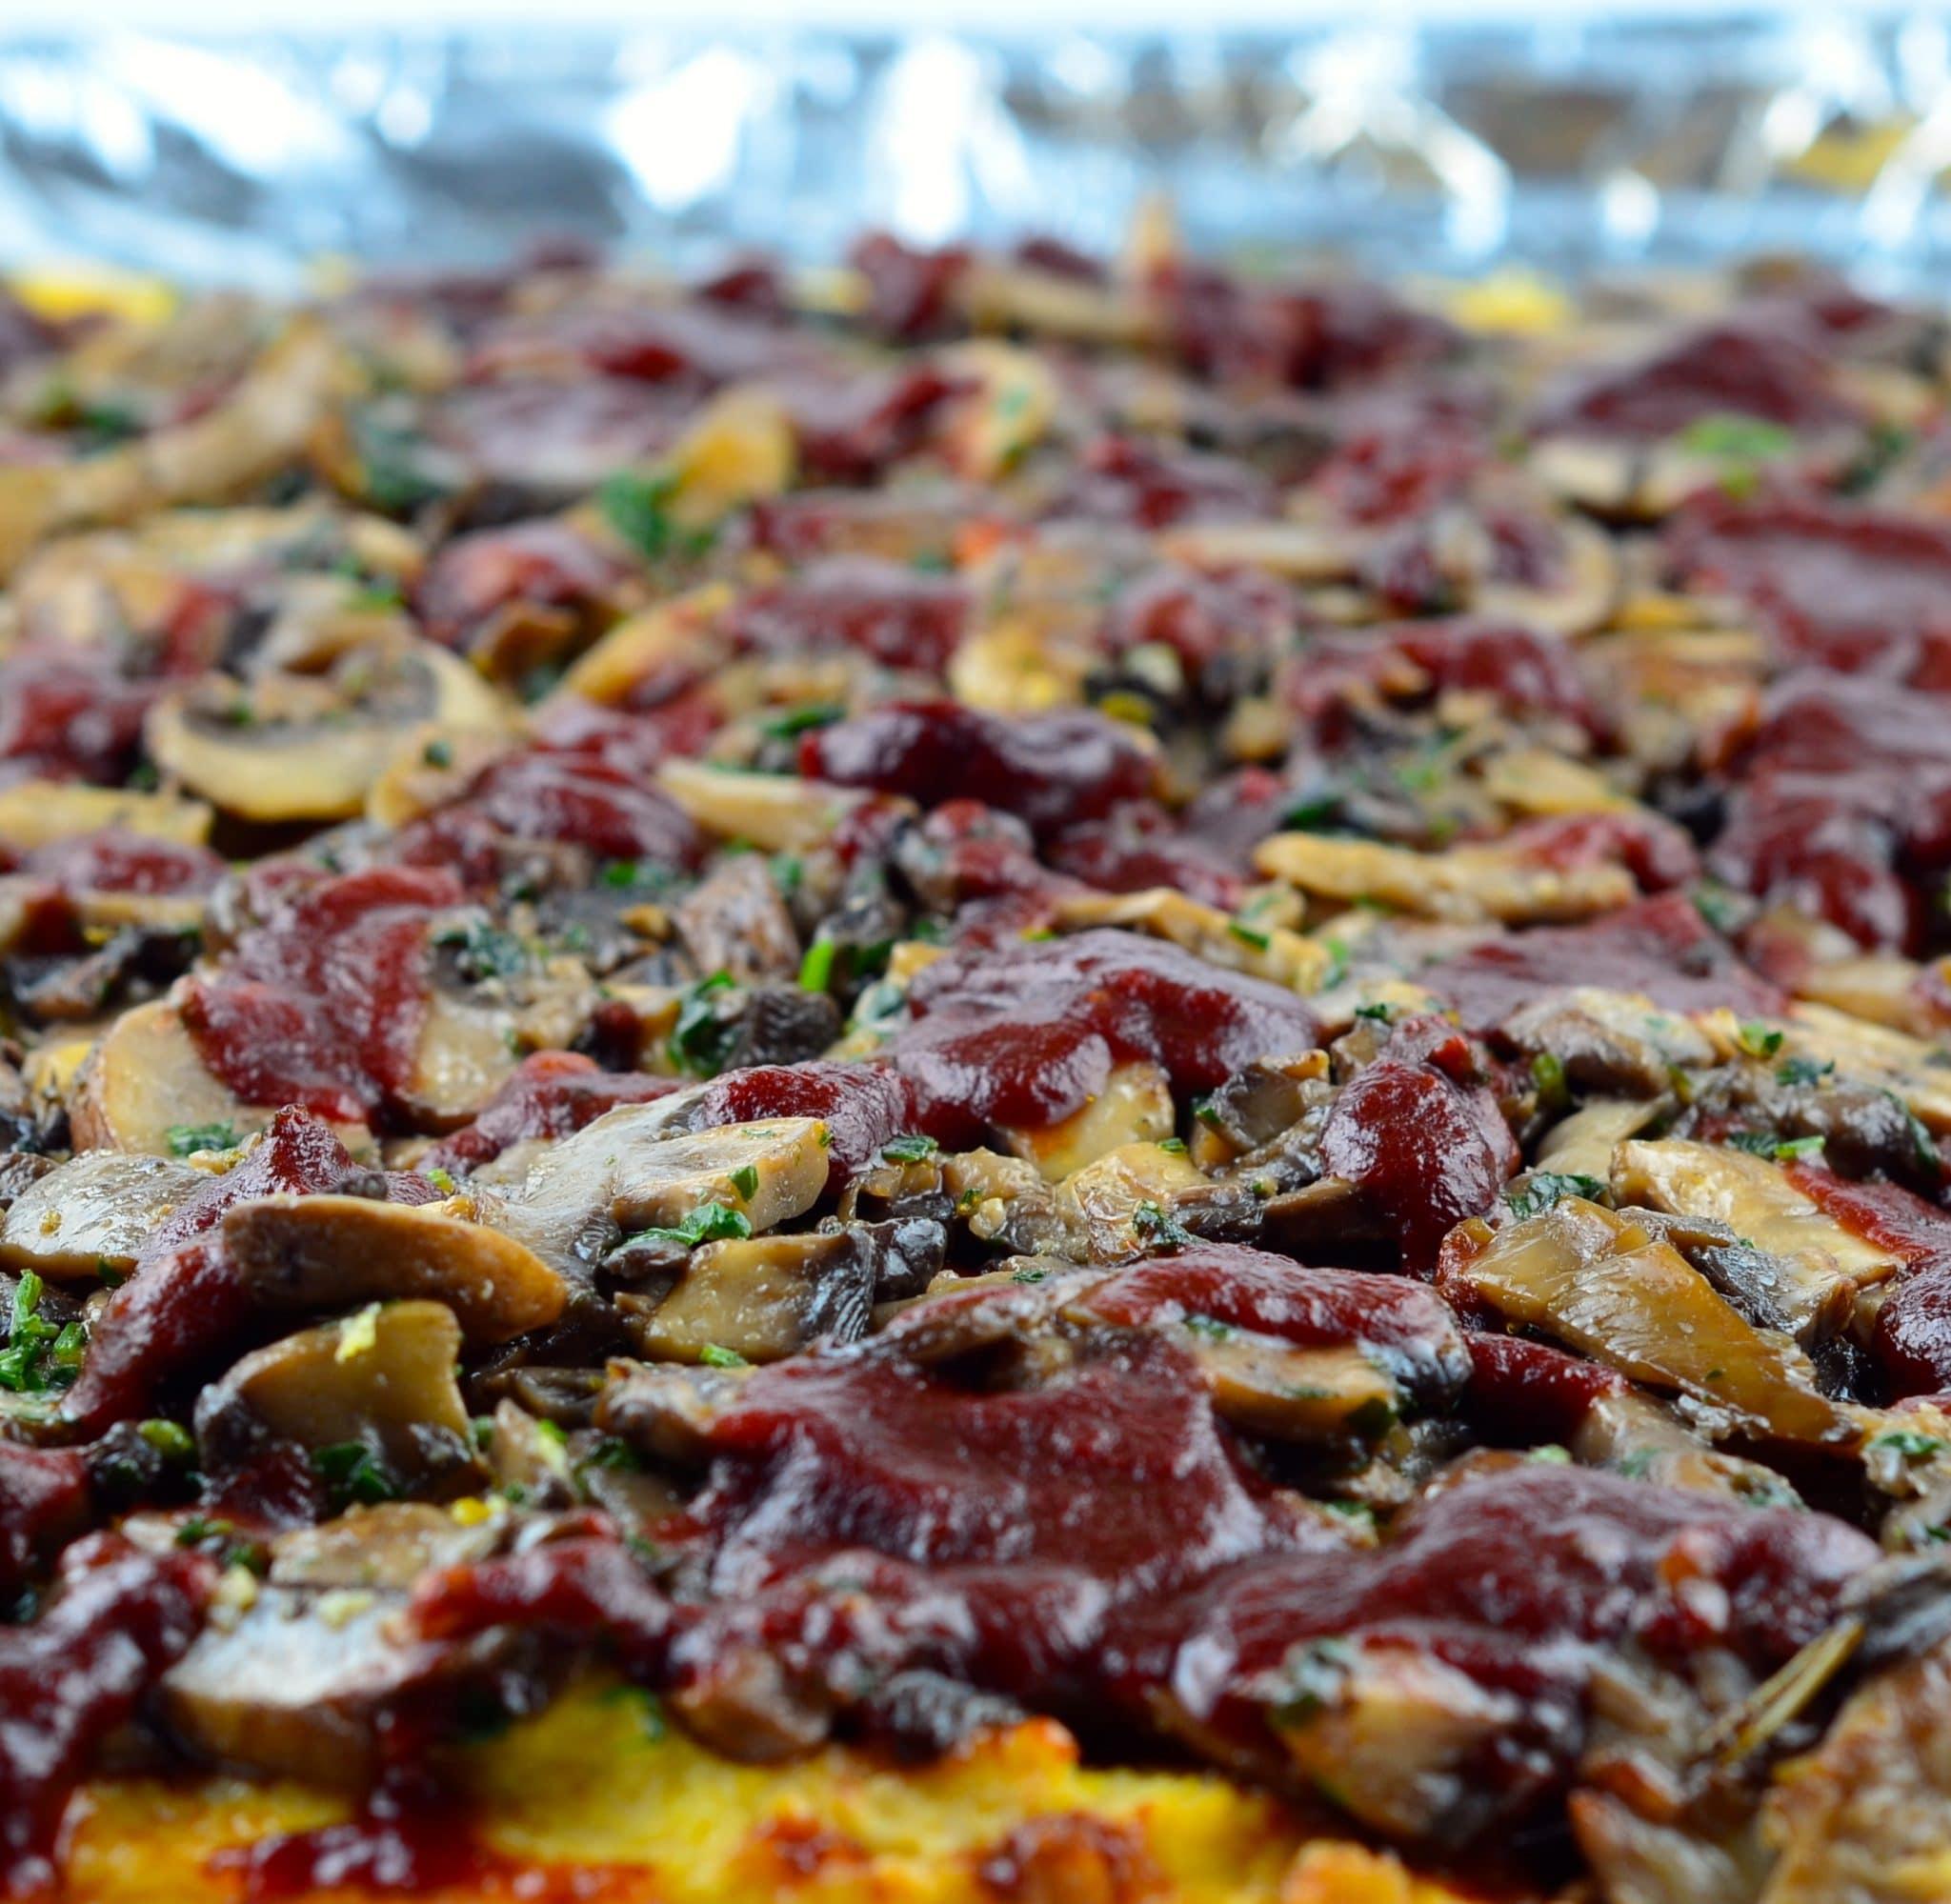 MEATLESS MONDAY – Cashew Polenta With Mushrooms & Tomato Pomegranate Reduction